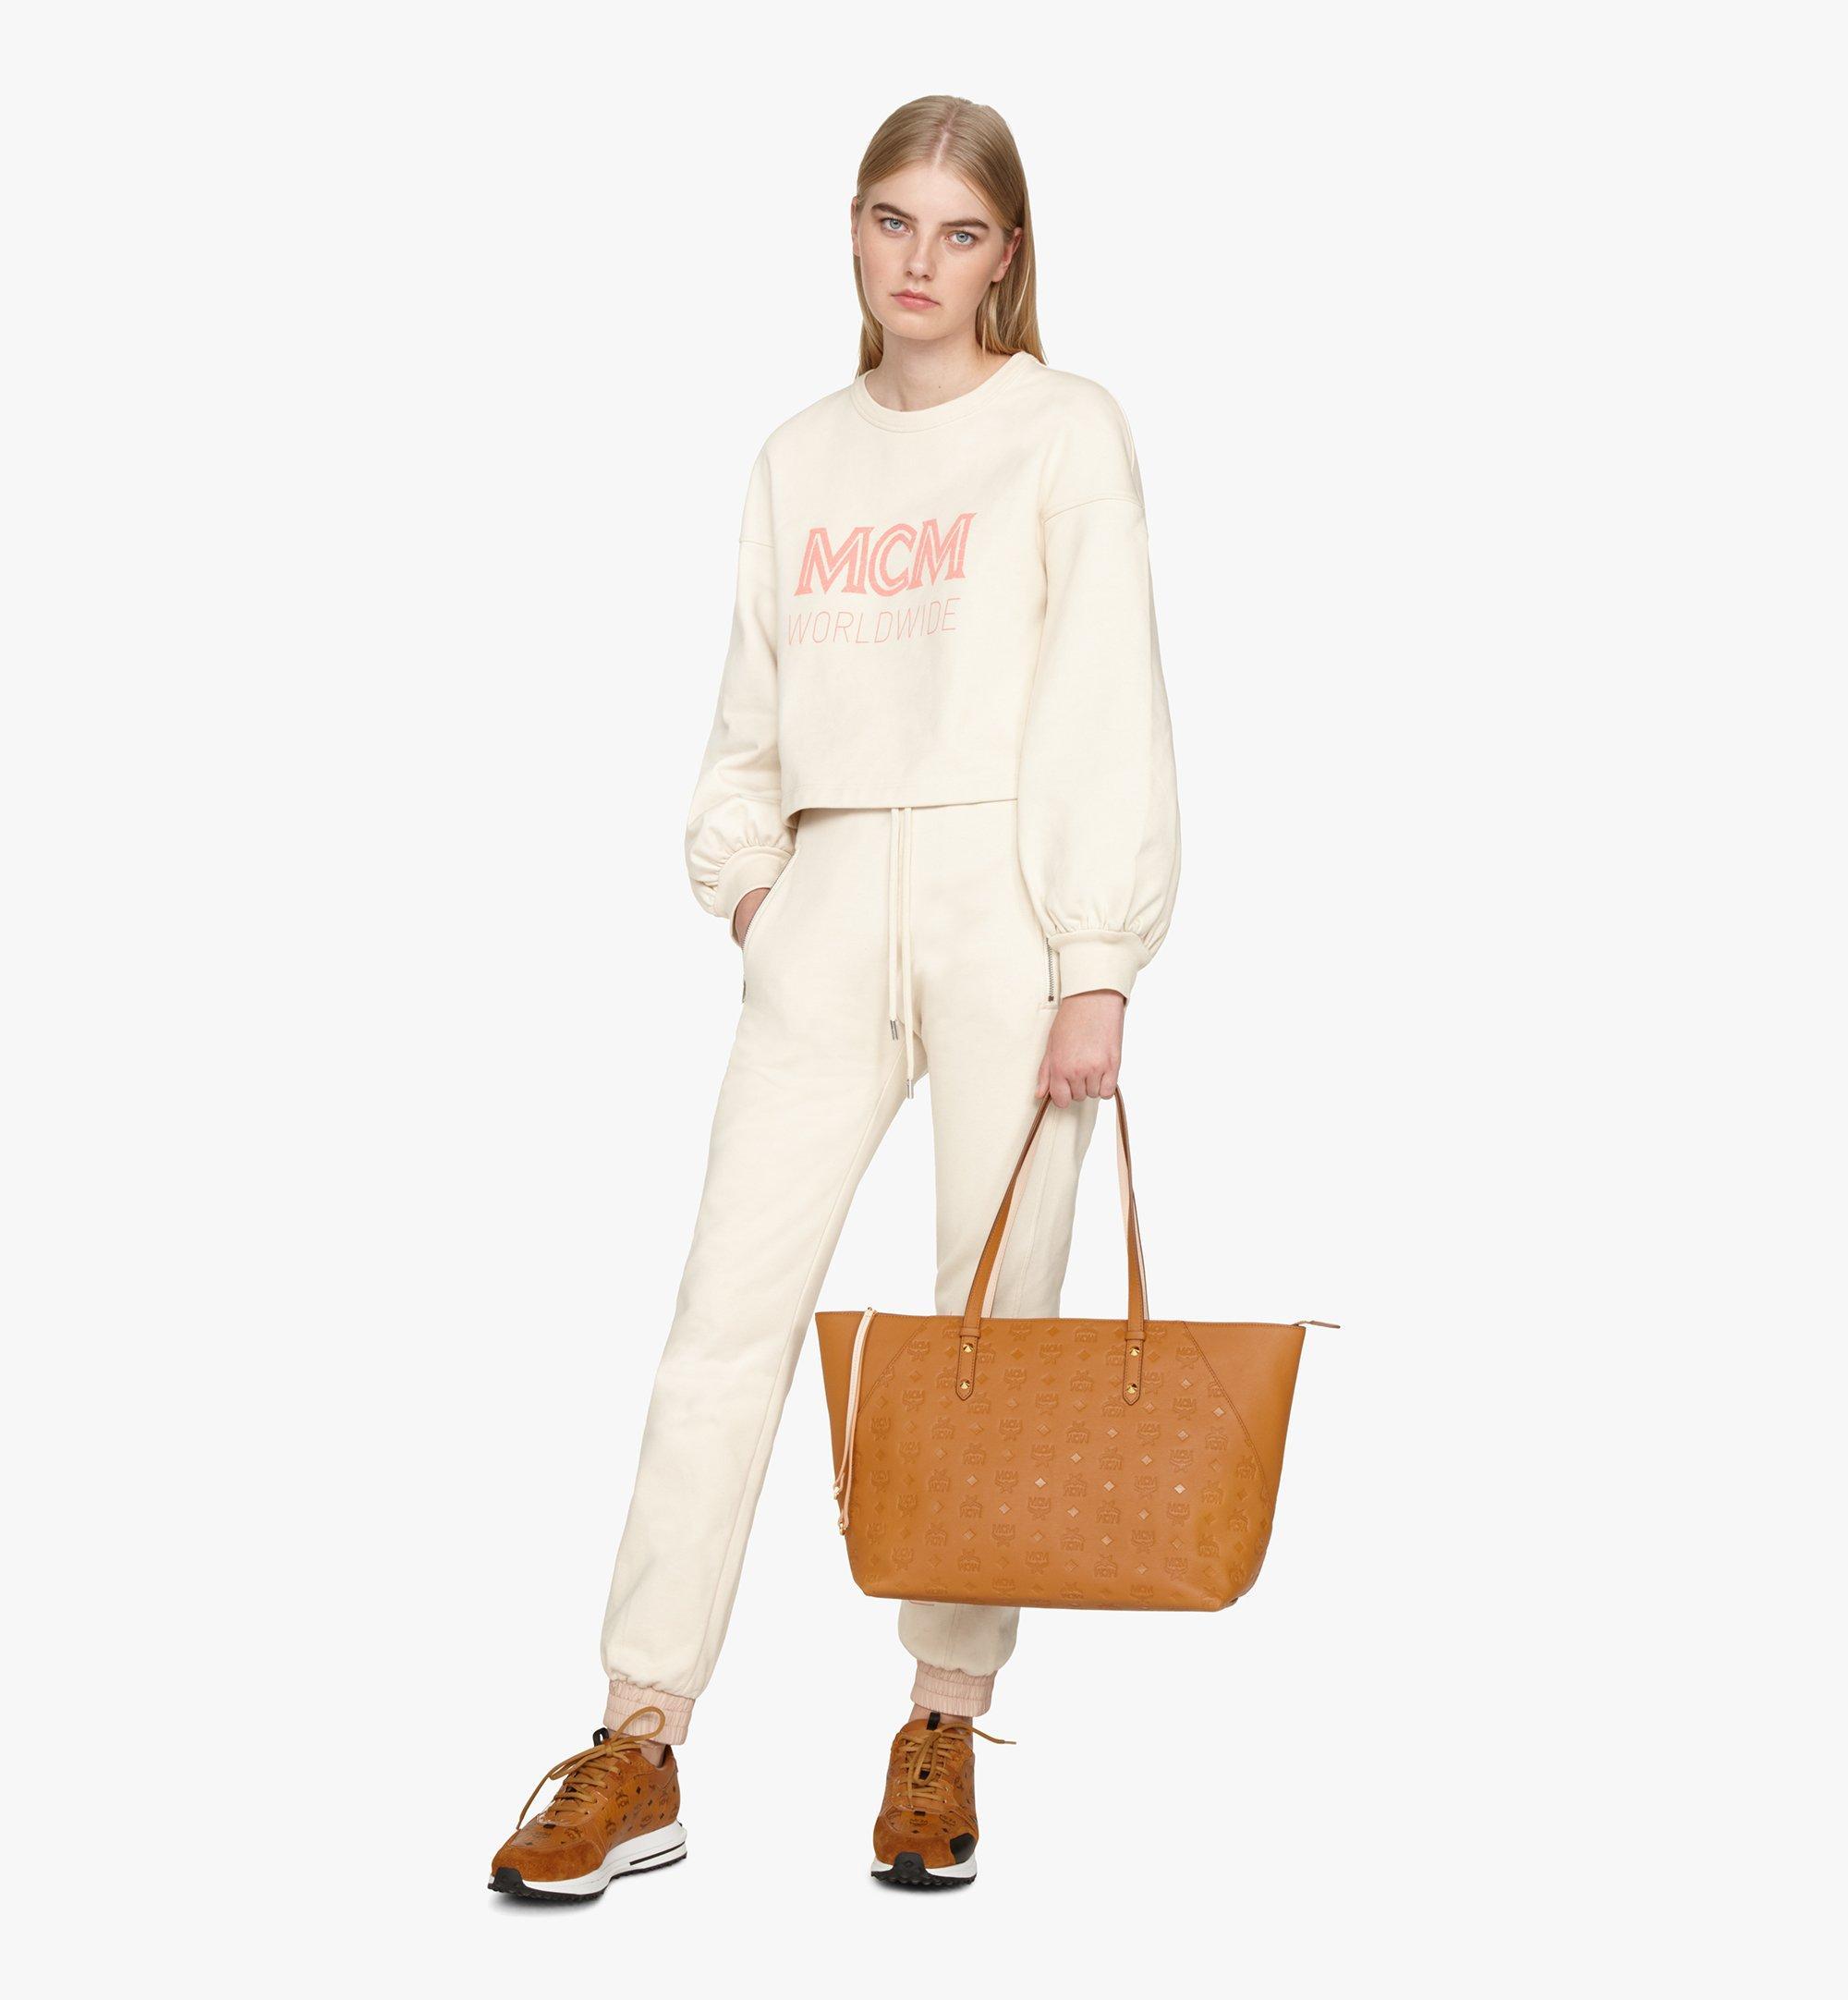 Medium Klara Shopper aus Leder mit Monogramm Cognac | MCM® DE